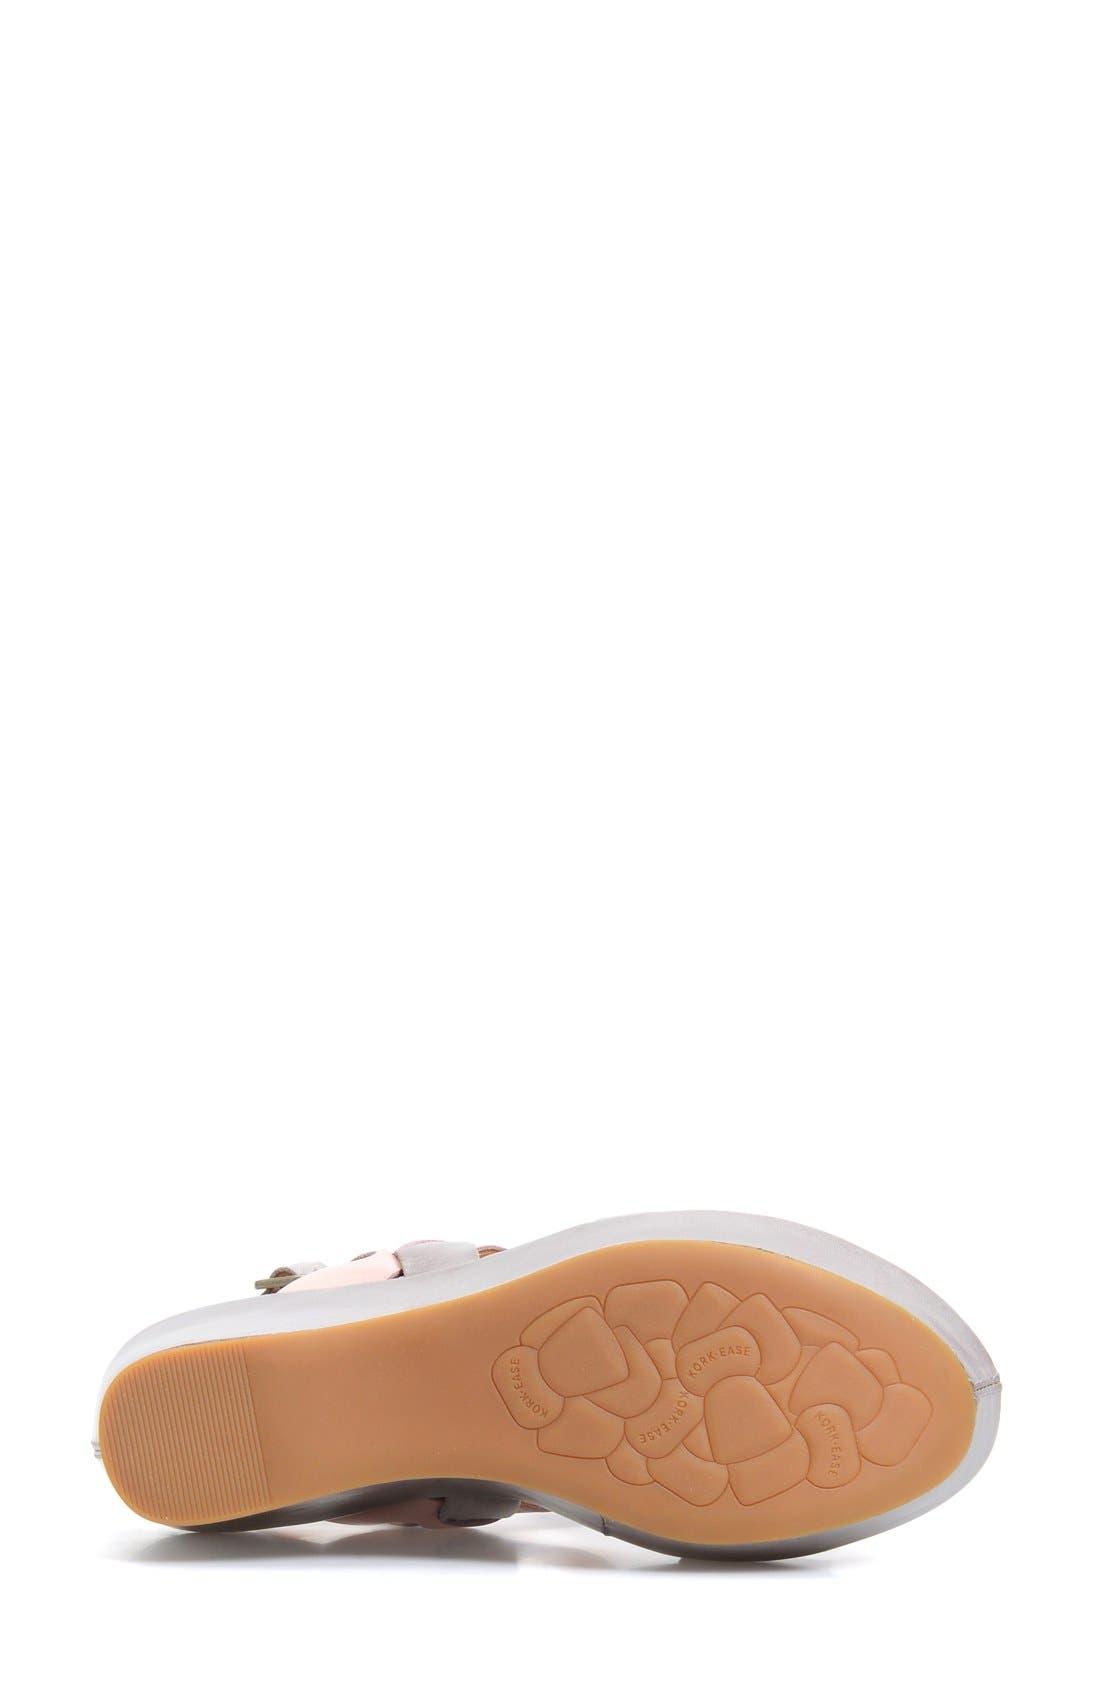 'Austin' Slingback Wedge Sandal,                             Alternate thumbnail 36, color,